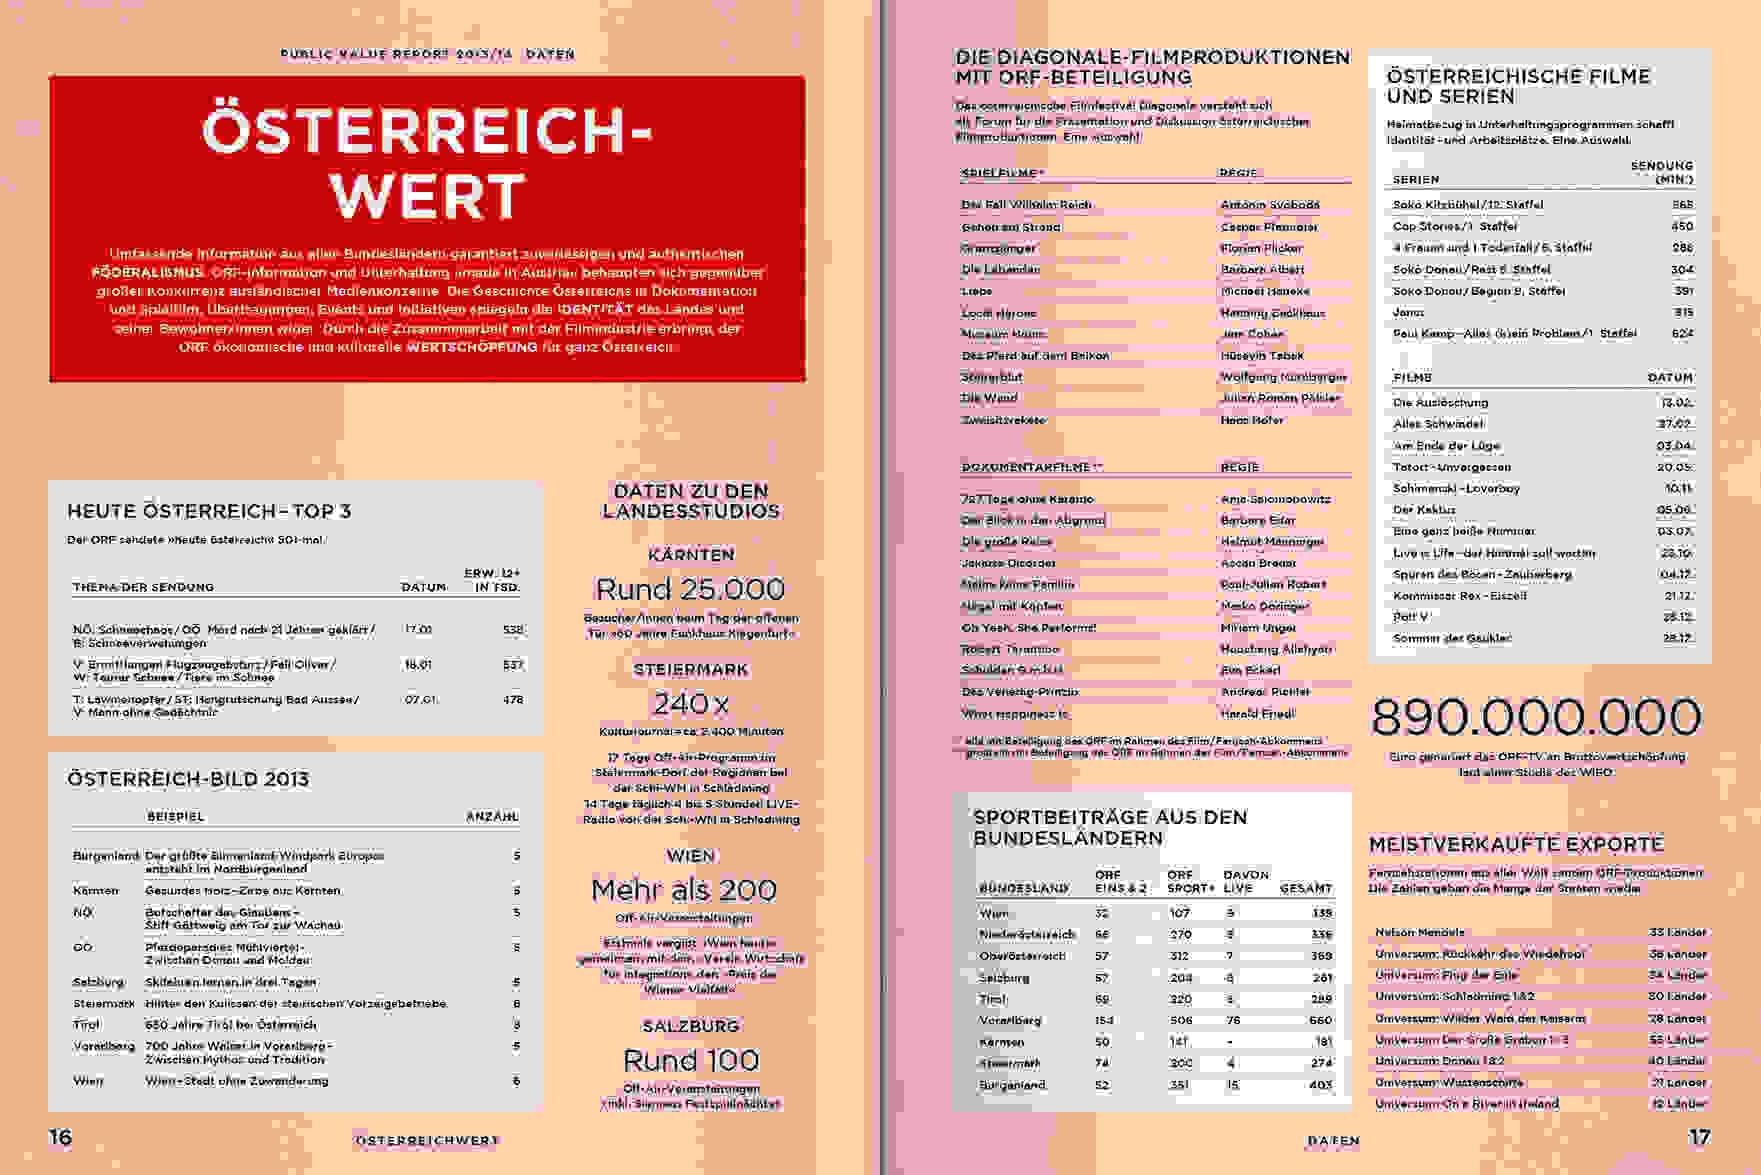 ORF PV 2014 Daten Doppelseite 5